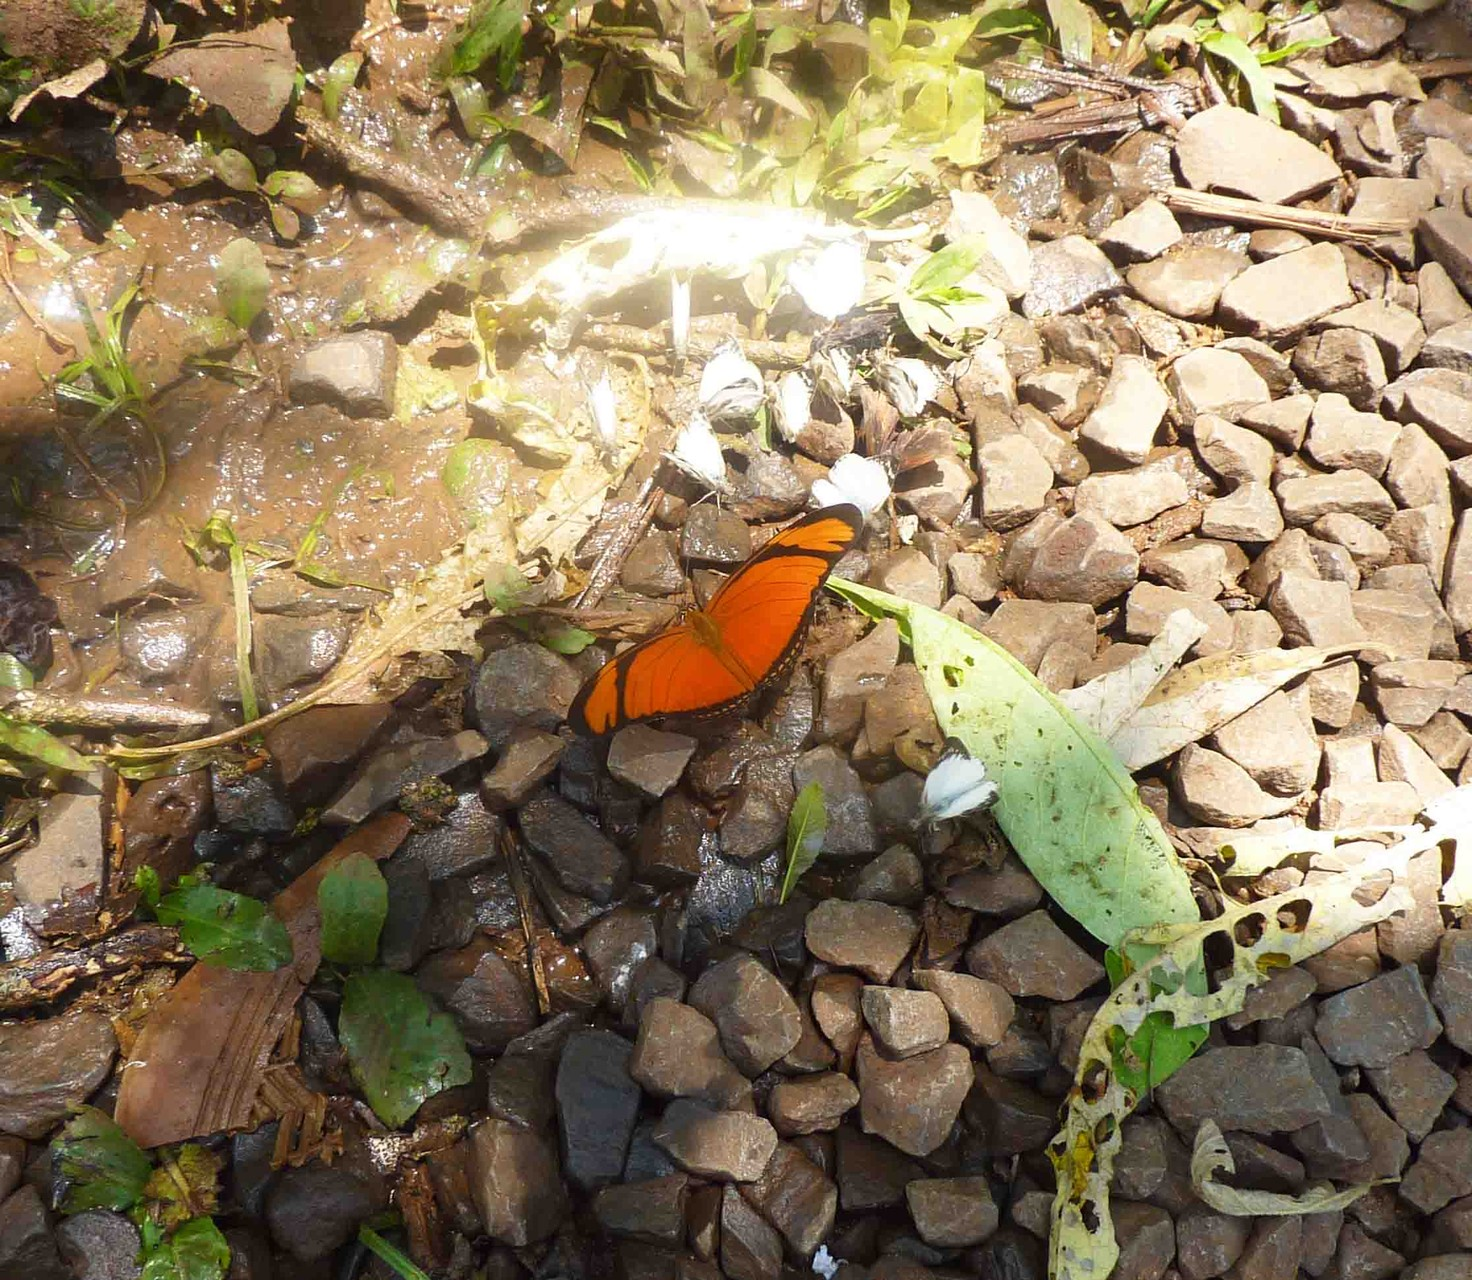 Un dryas iulia dit aussi flambeau ou papillon flamme